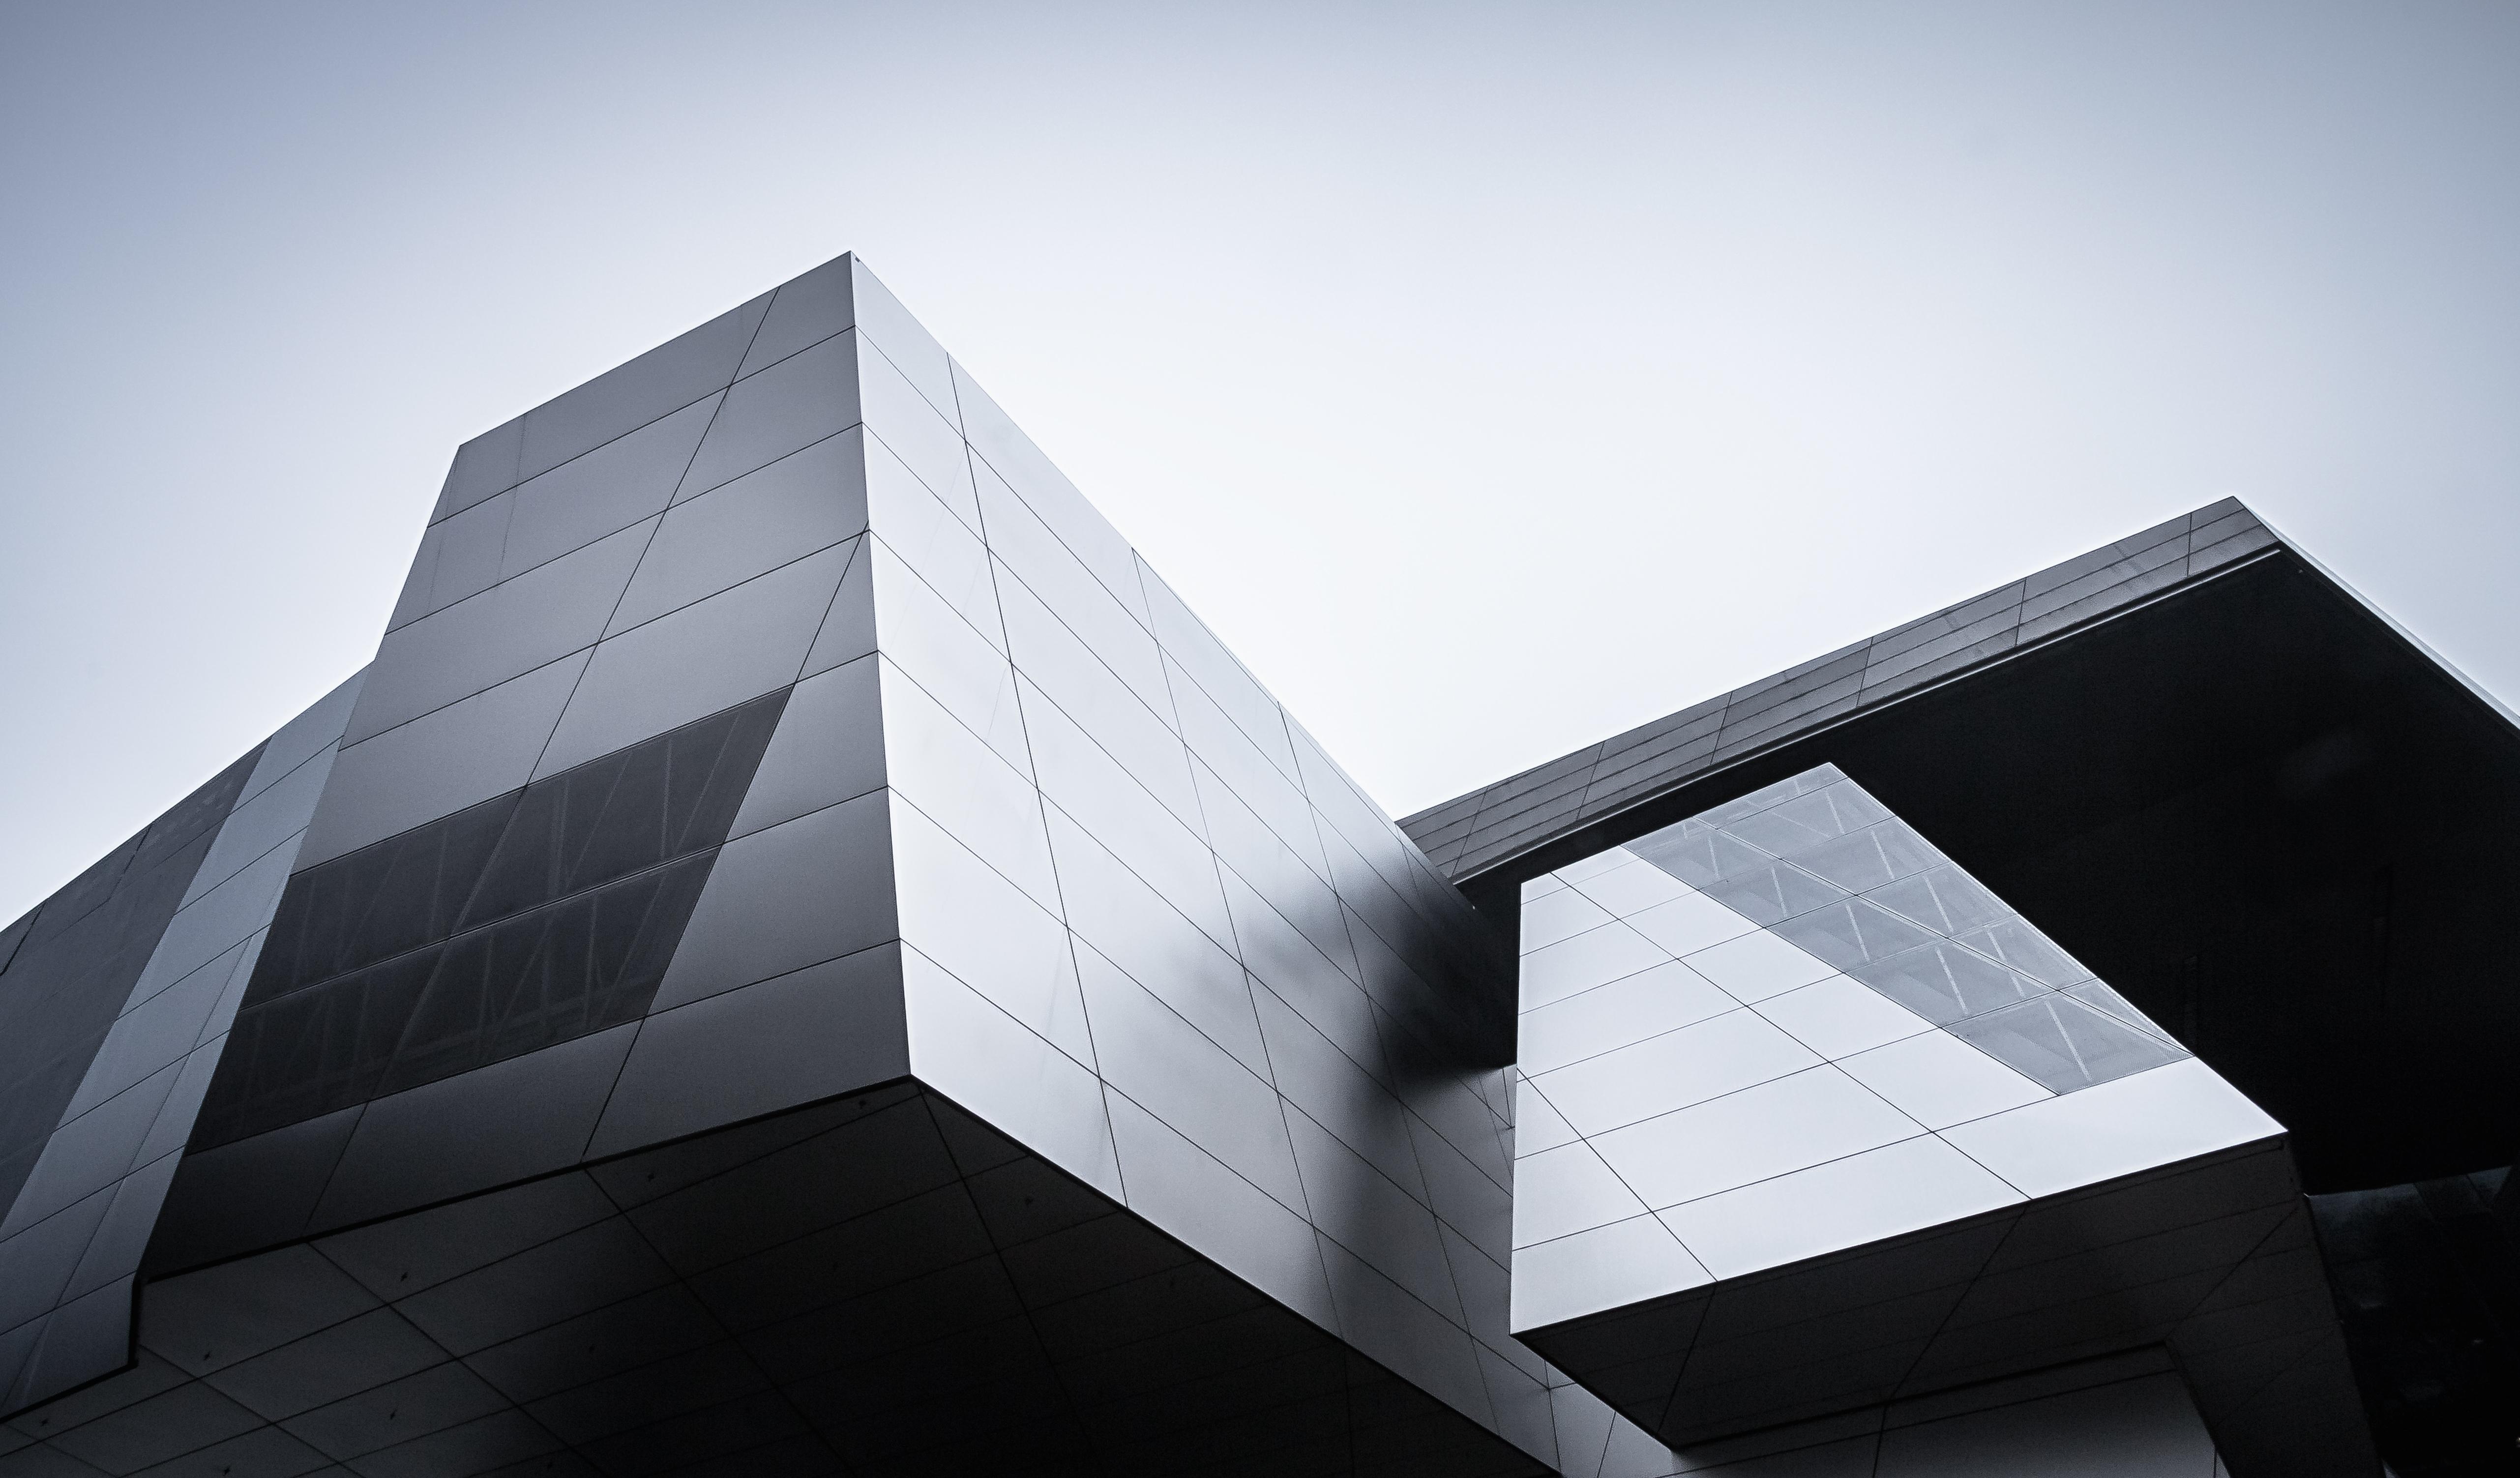 fond d 39 cran architecture ciel structure lumi re du jour ligne si ge social fa ade. Black Bedroom Furniture Sets. Home Design Ideas